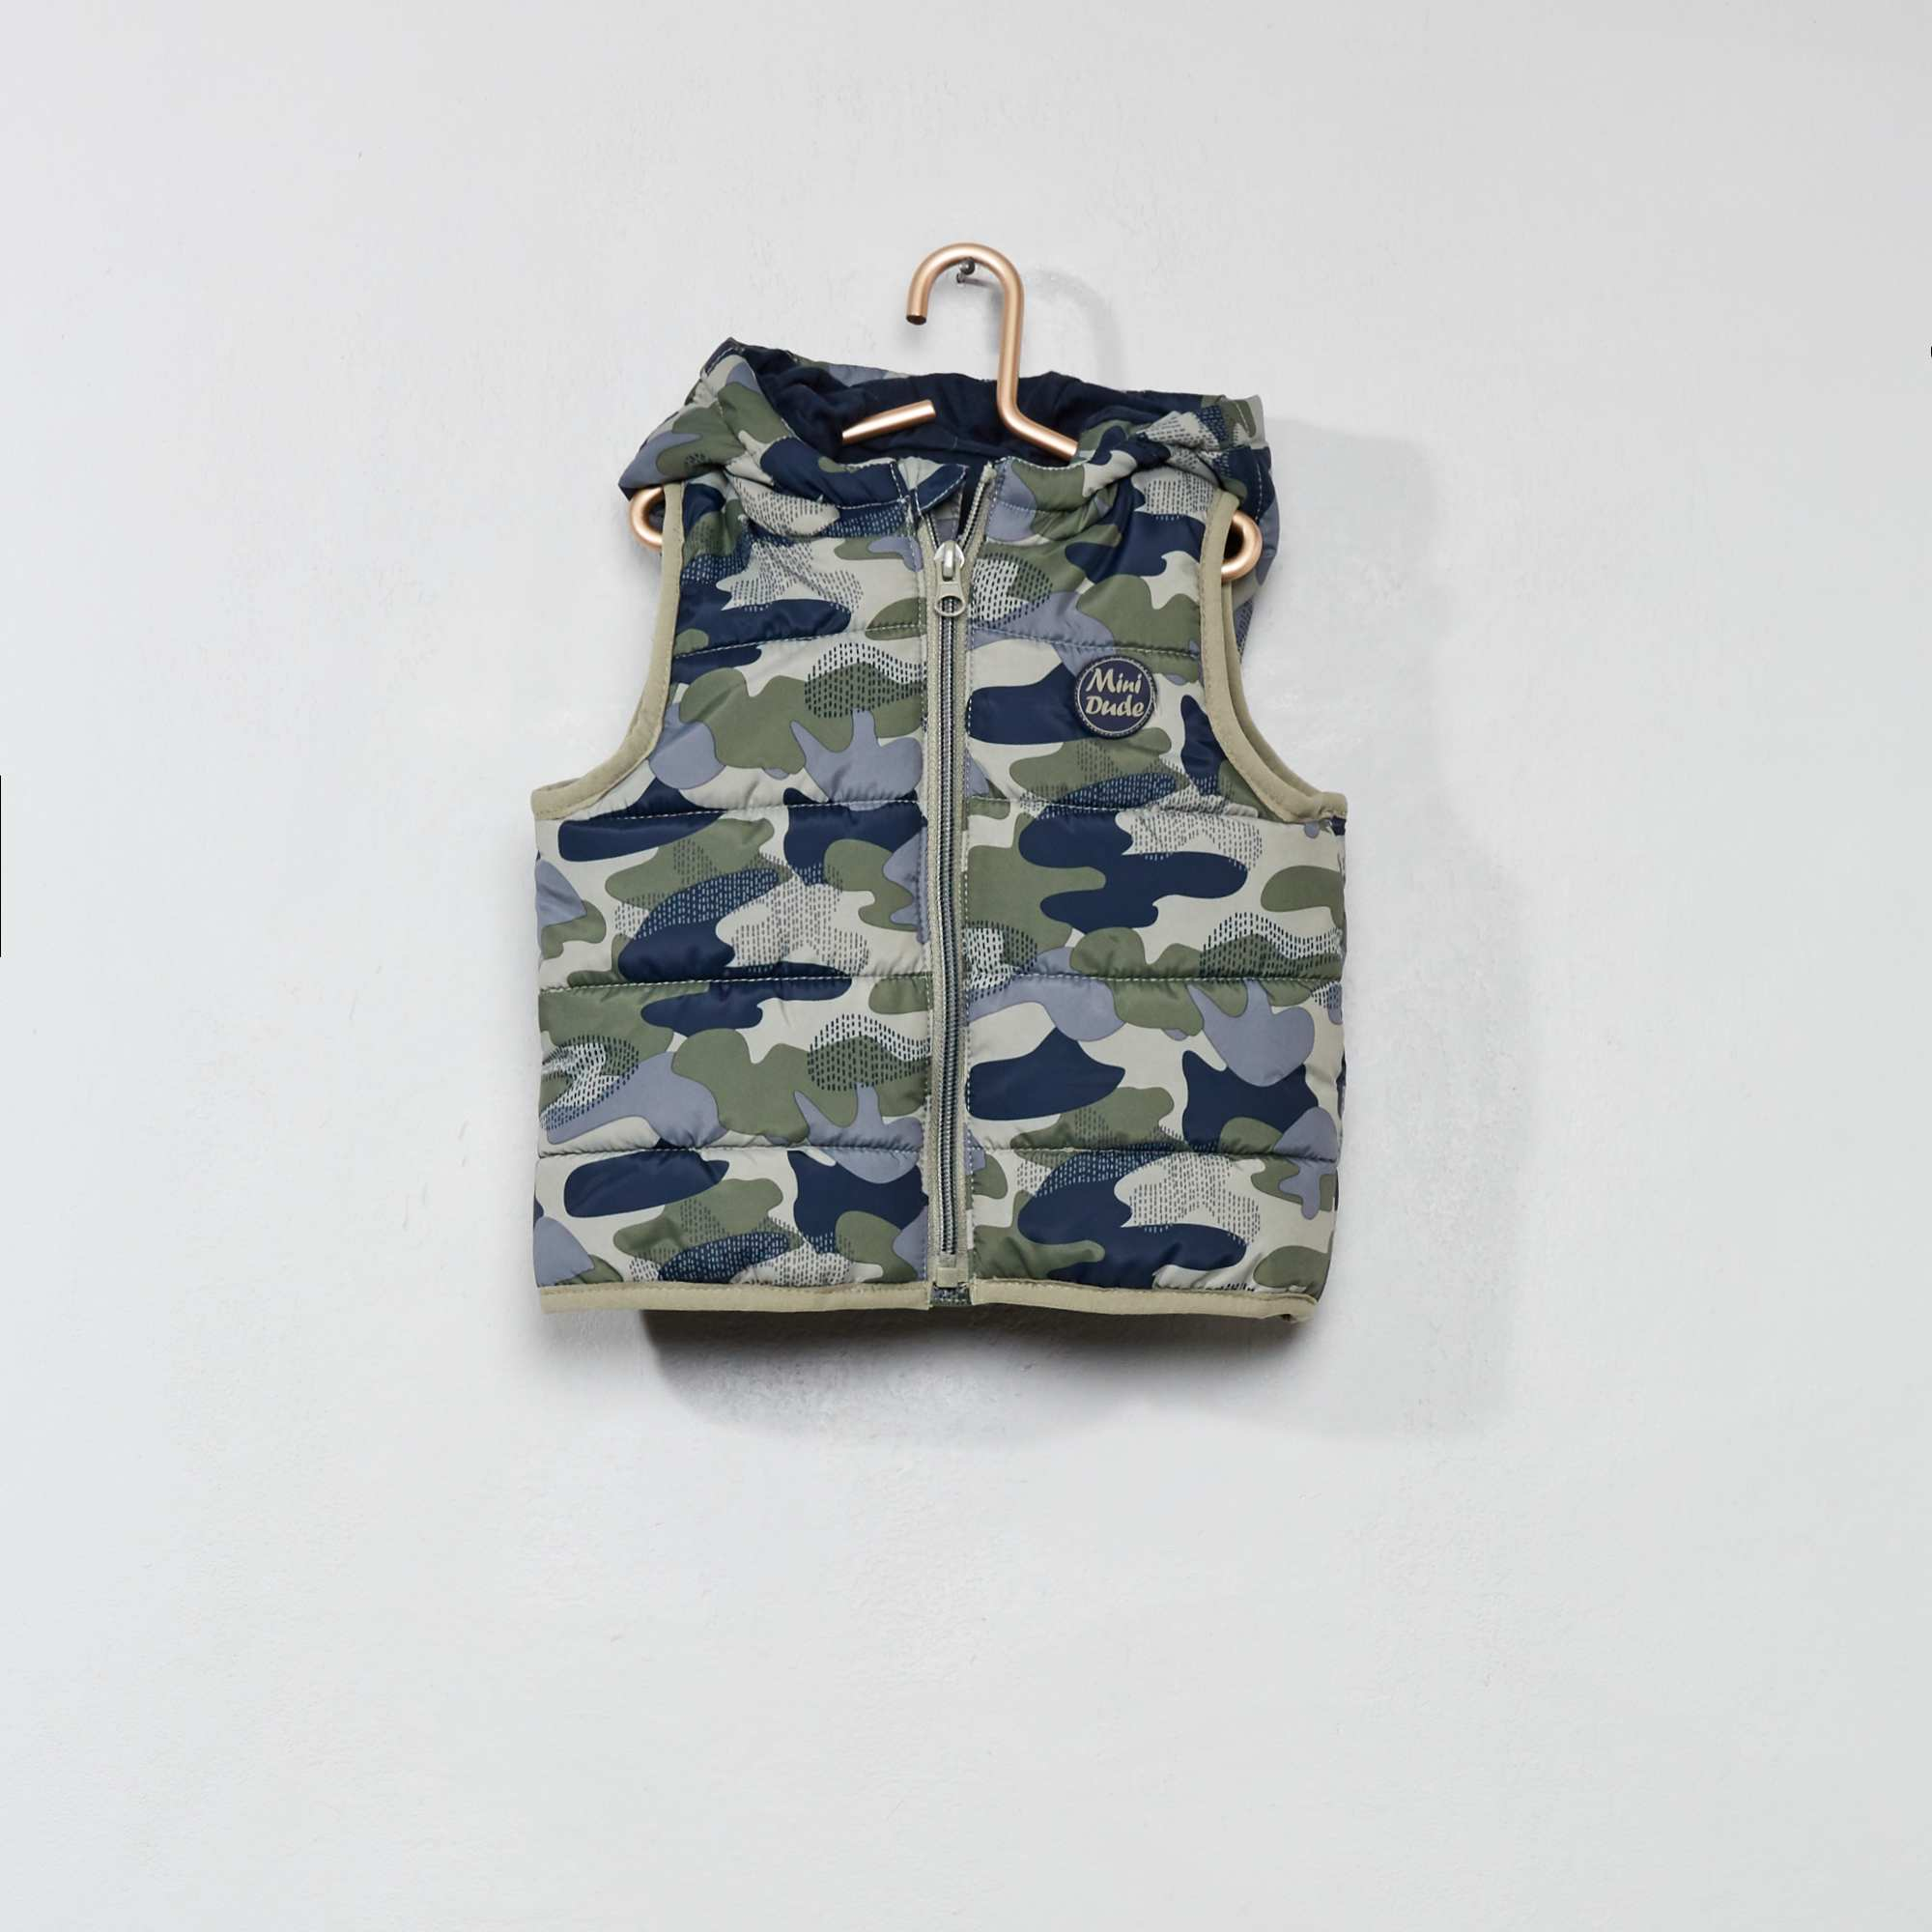 dd6a2fc1dd4 Doudoune sans manches Bébé garçon - camouflage - Kiabi - 8